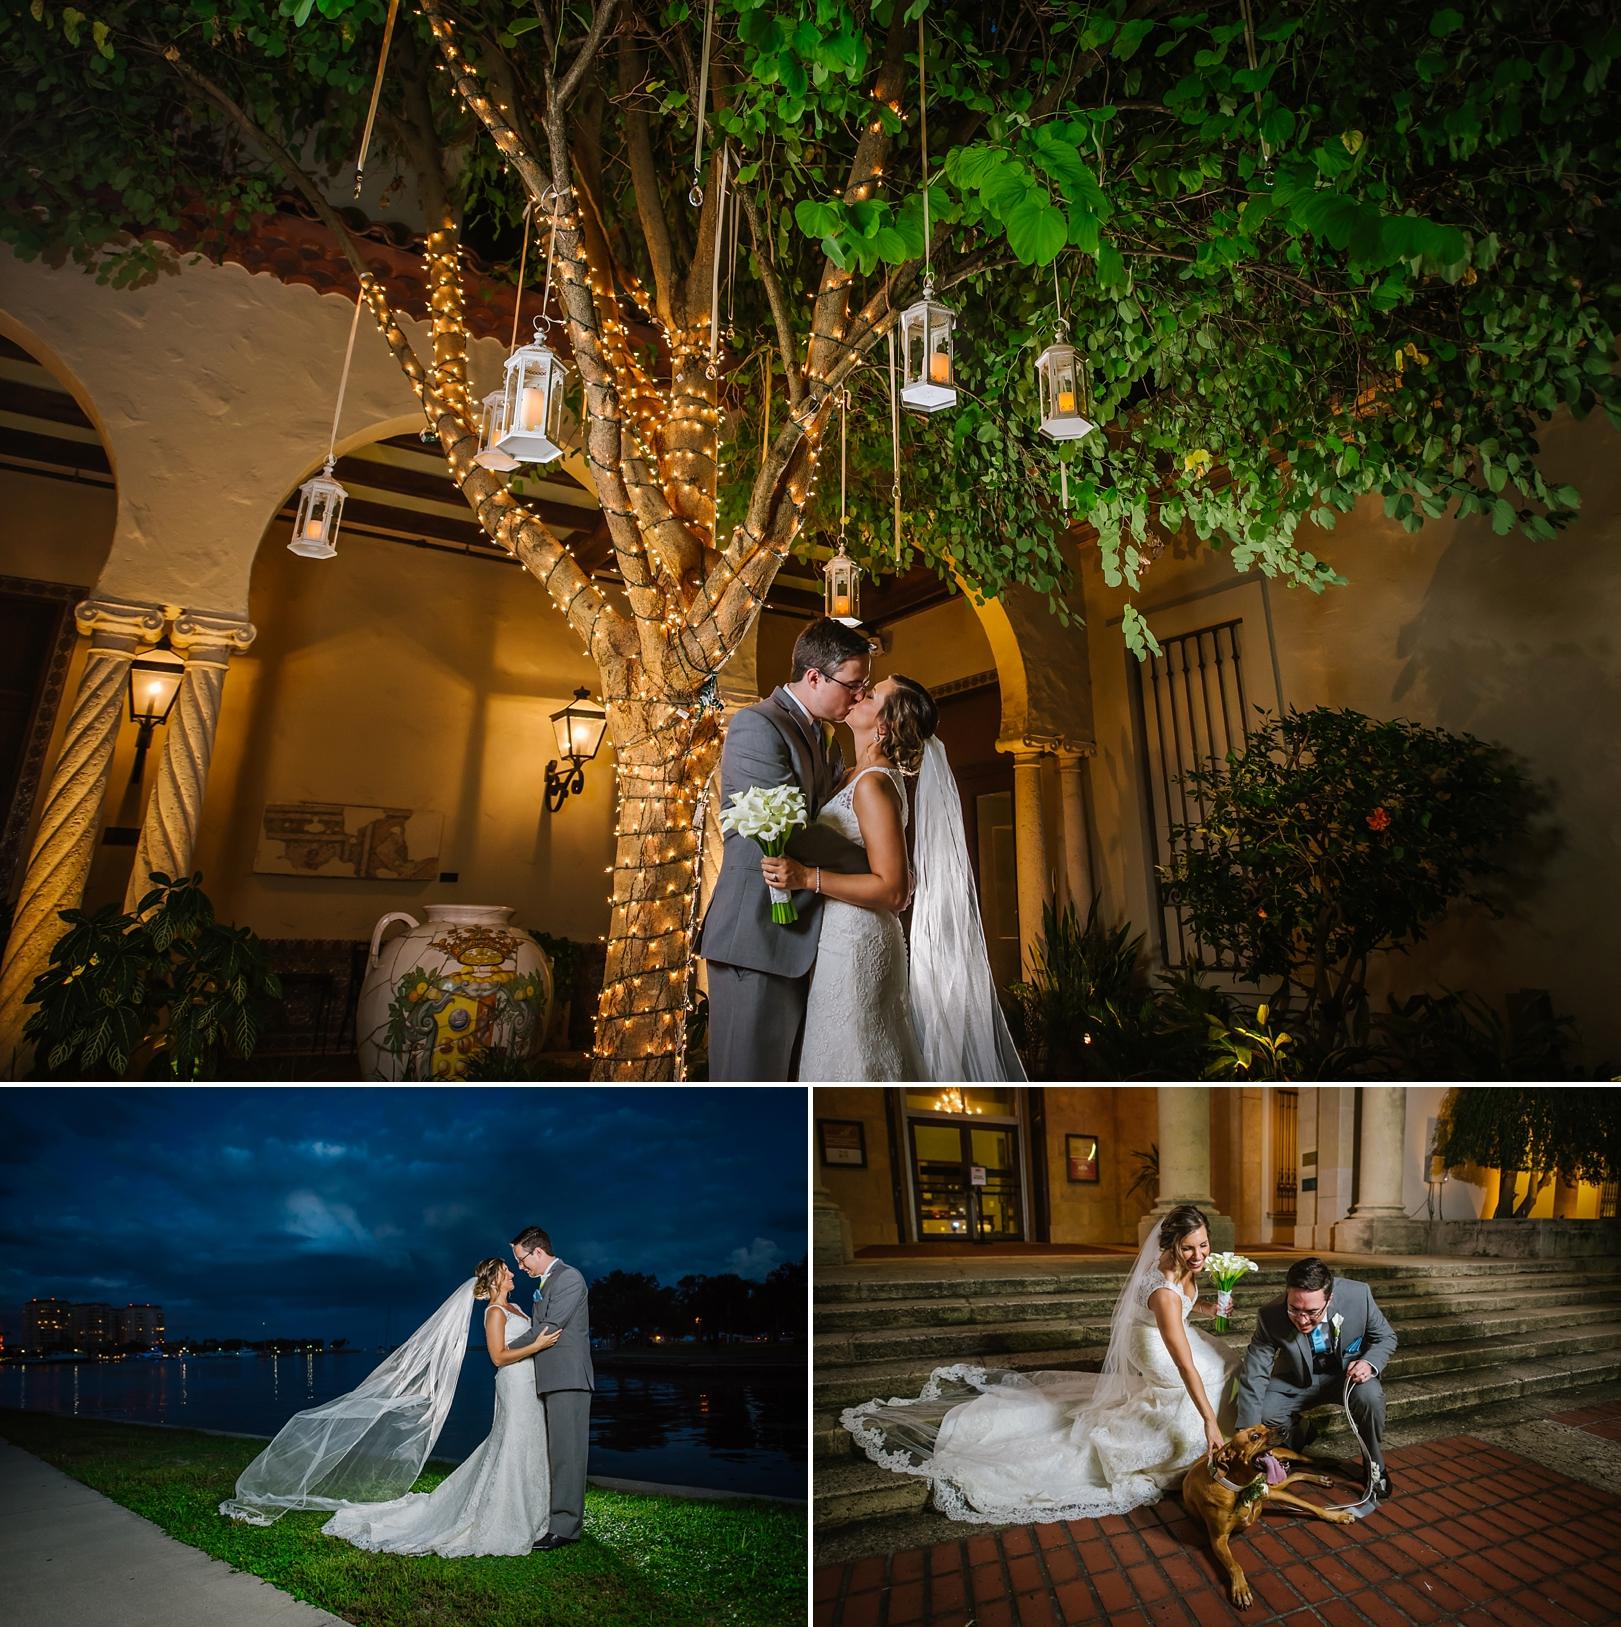 st-pete-art-museum-wedding-vinoy-ashlee-hamon-photography_0016.jpg